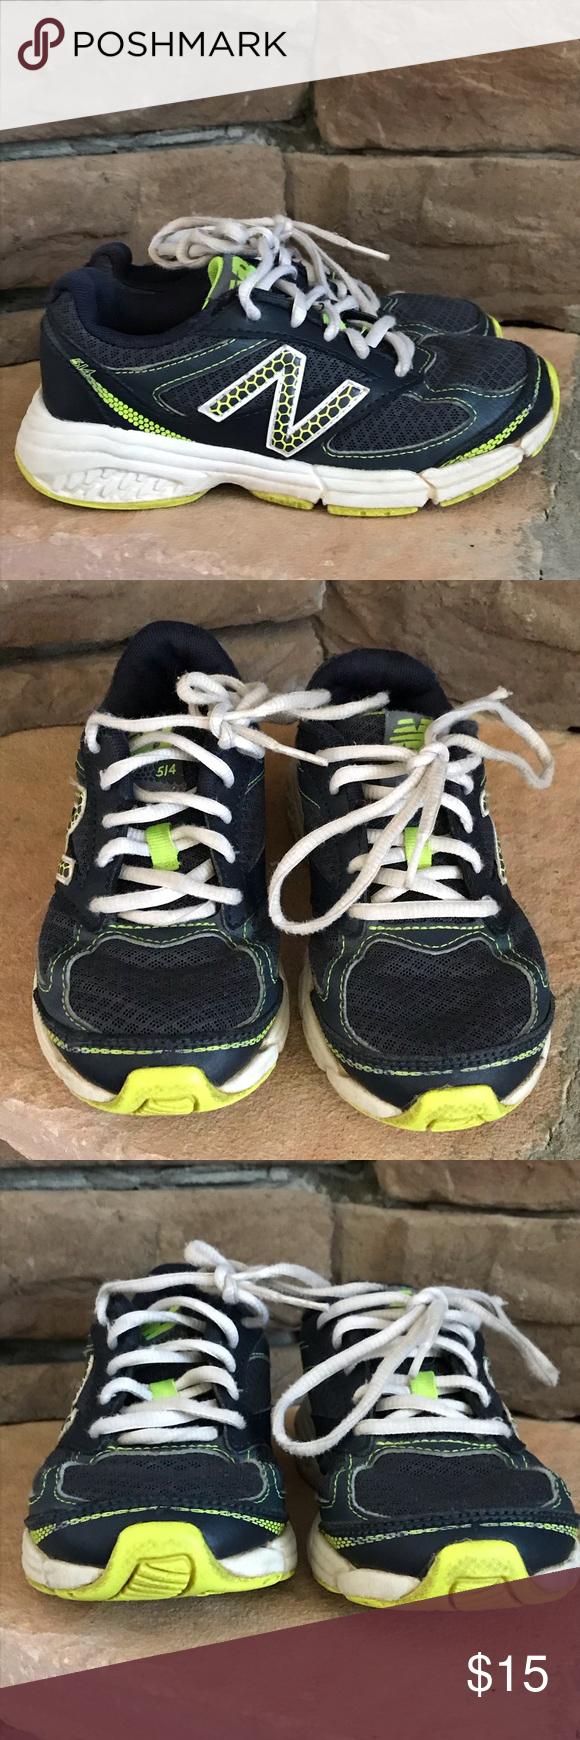 NB 514 preschool boys tennis shoes